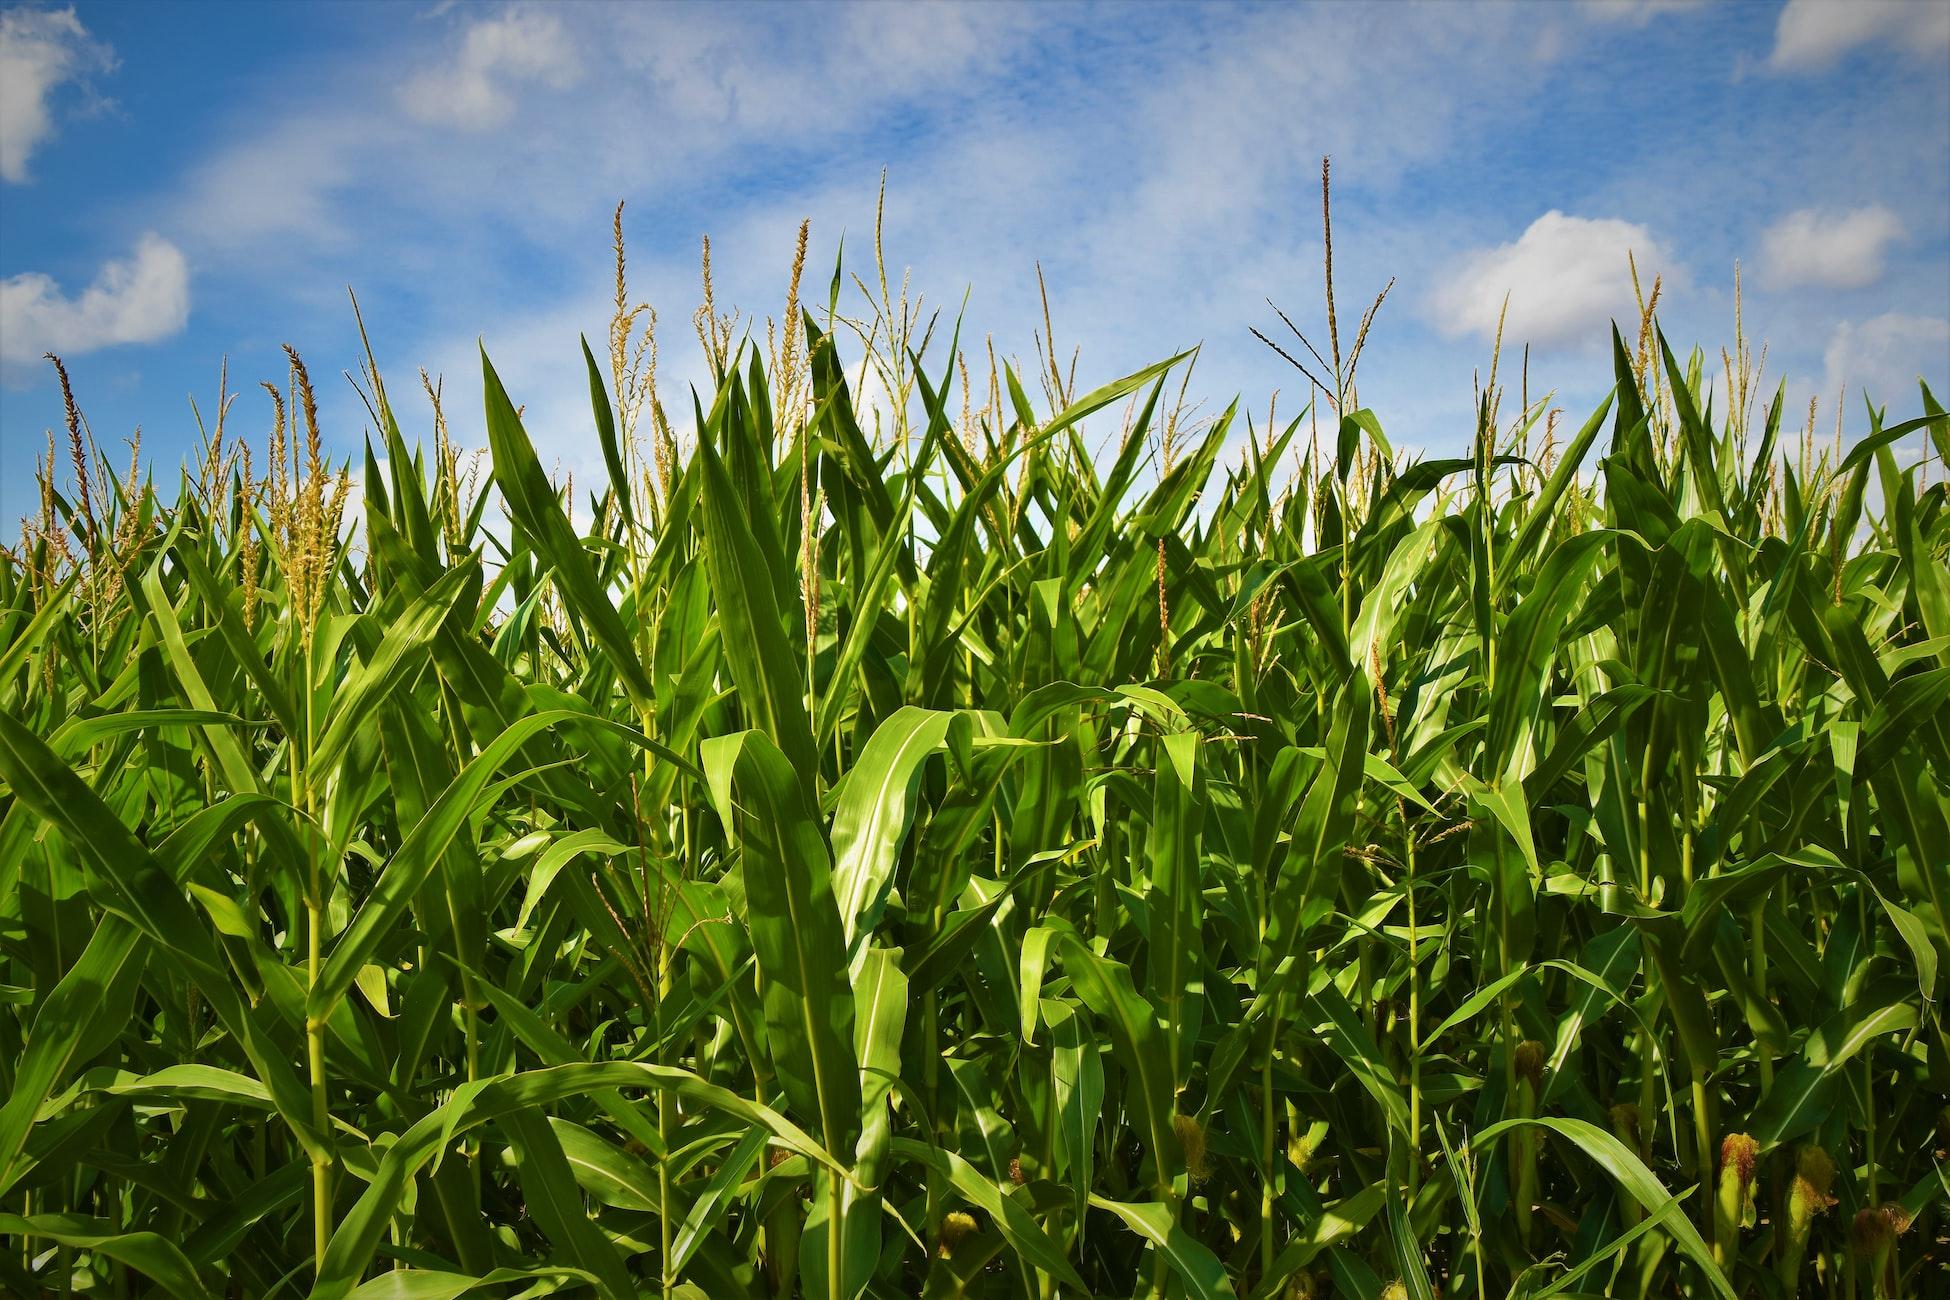 Good News for Wildlife and Habitat: Non-GMO Corn Hybrids Smash GMO Varieties in Illinois Trials